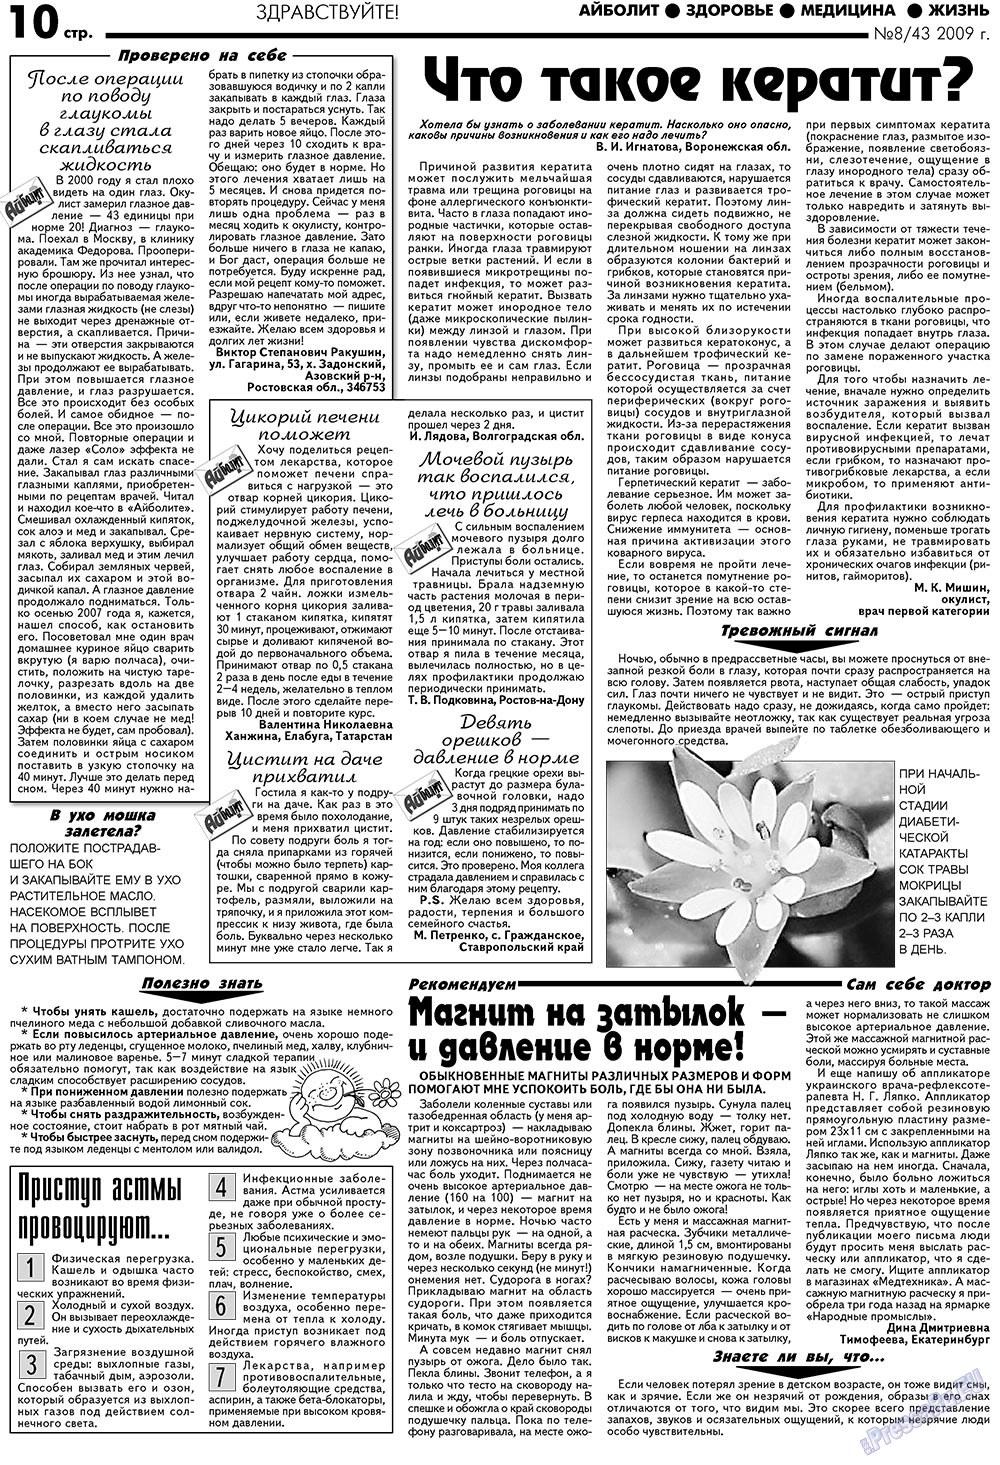 АйБолит (газета). 2009 год, номер 8, стр. 10